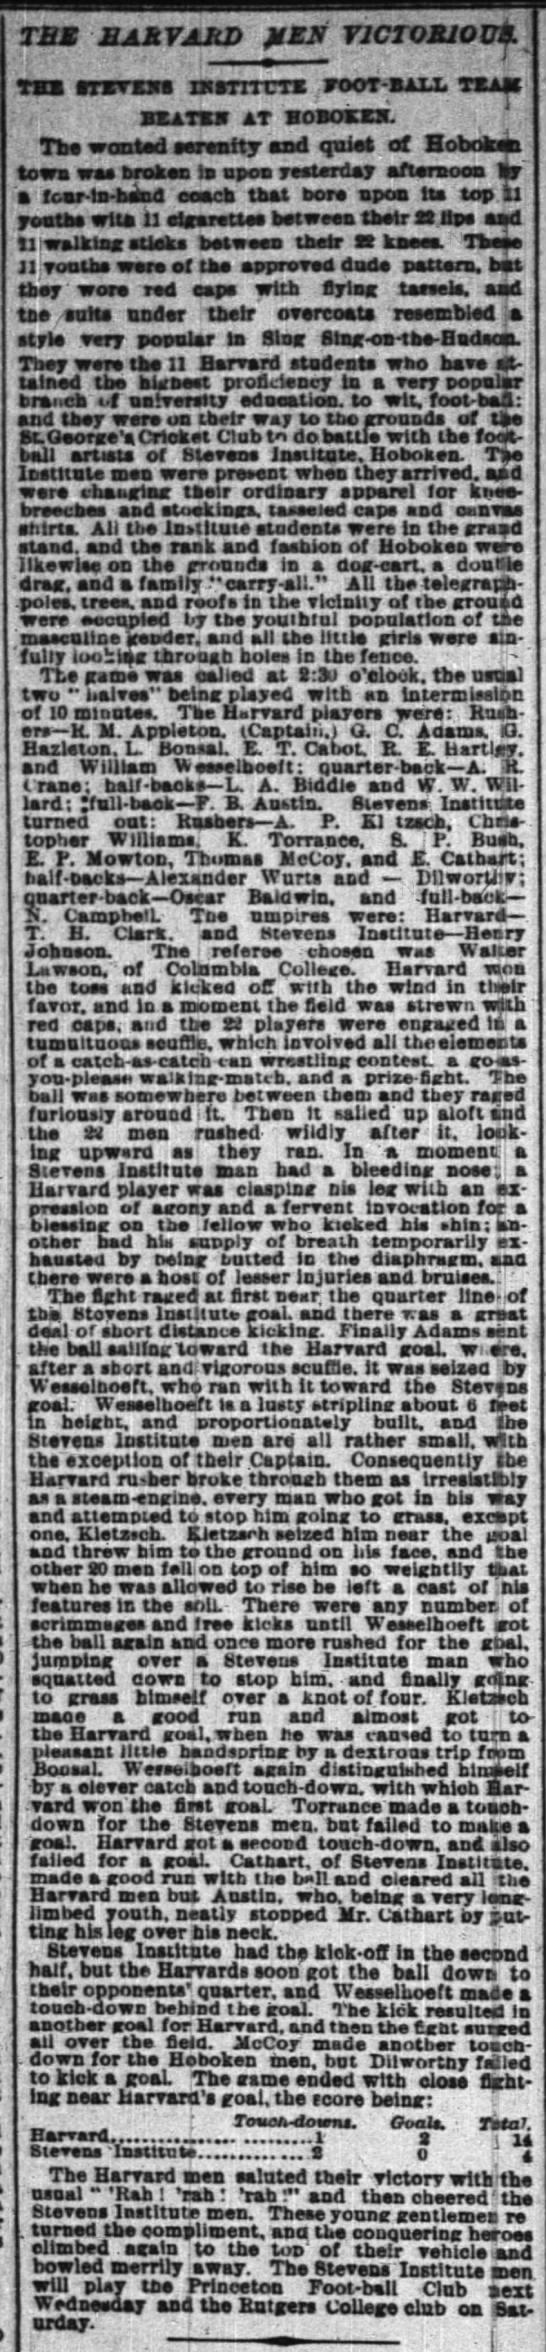 The Harvard Men Victorious: The Stevens Institute Foot-Ball Team Beaten at Hoboken -